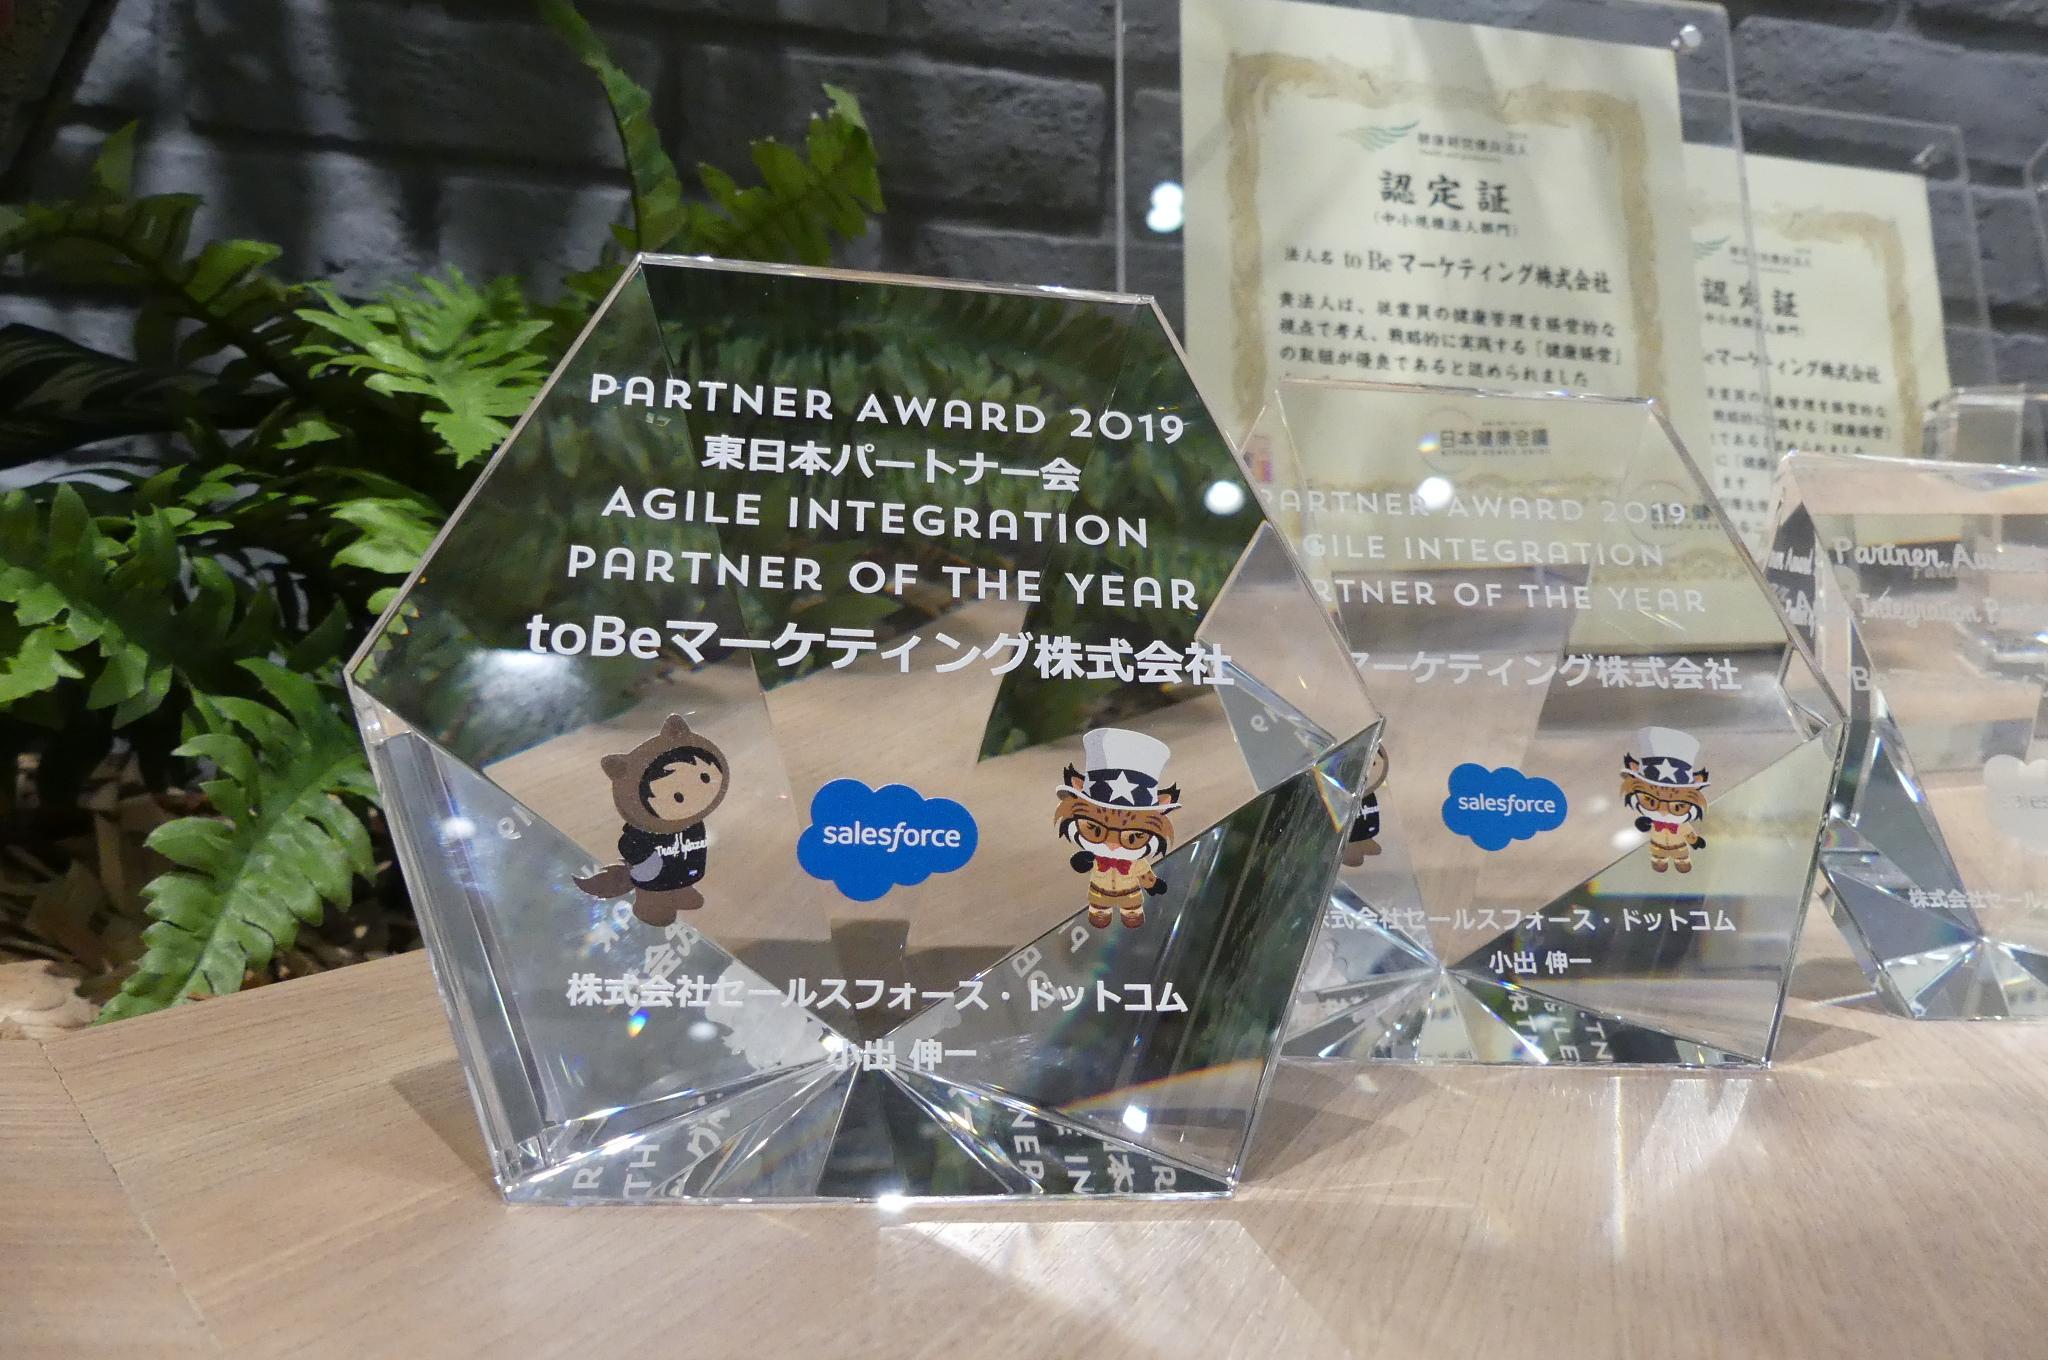 PartnerAward2019東日本パートナー会.JPG